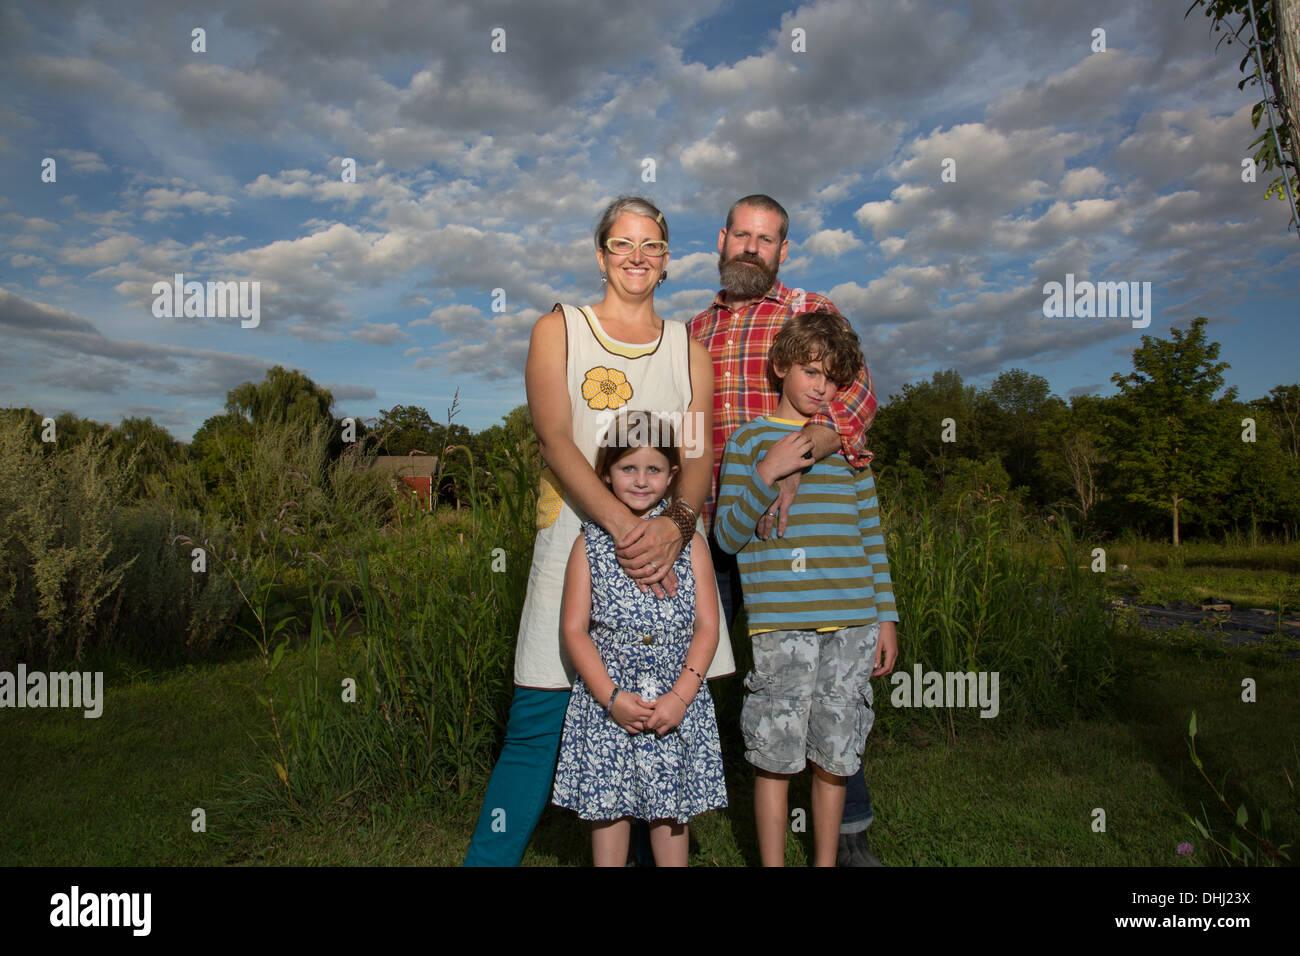 Retrato de pareja con hijos en la familia herb farm Imagen De Stock